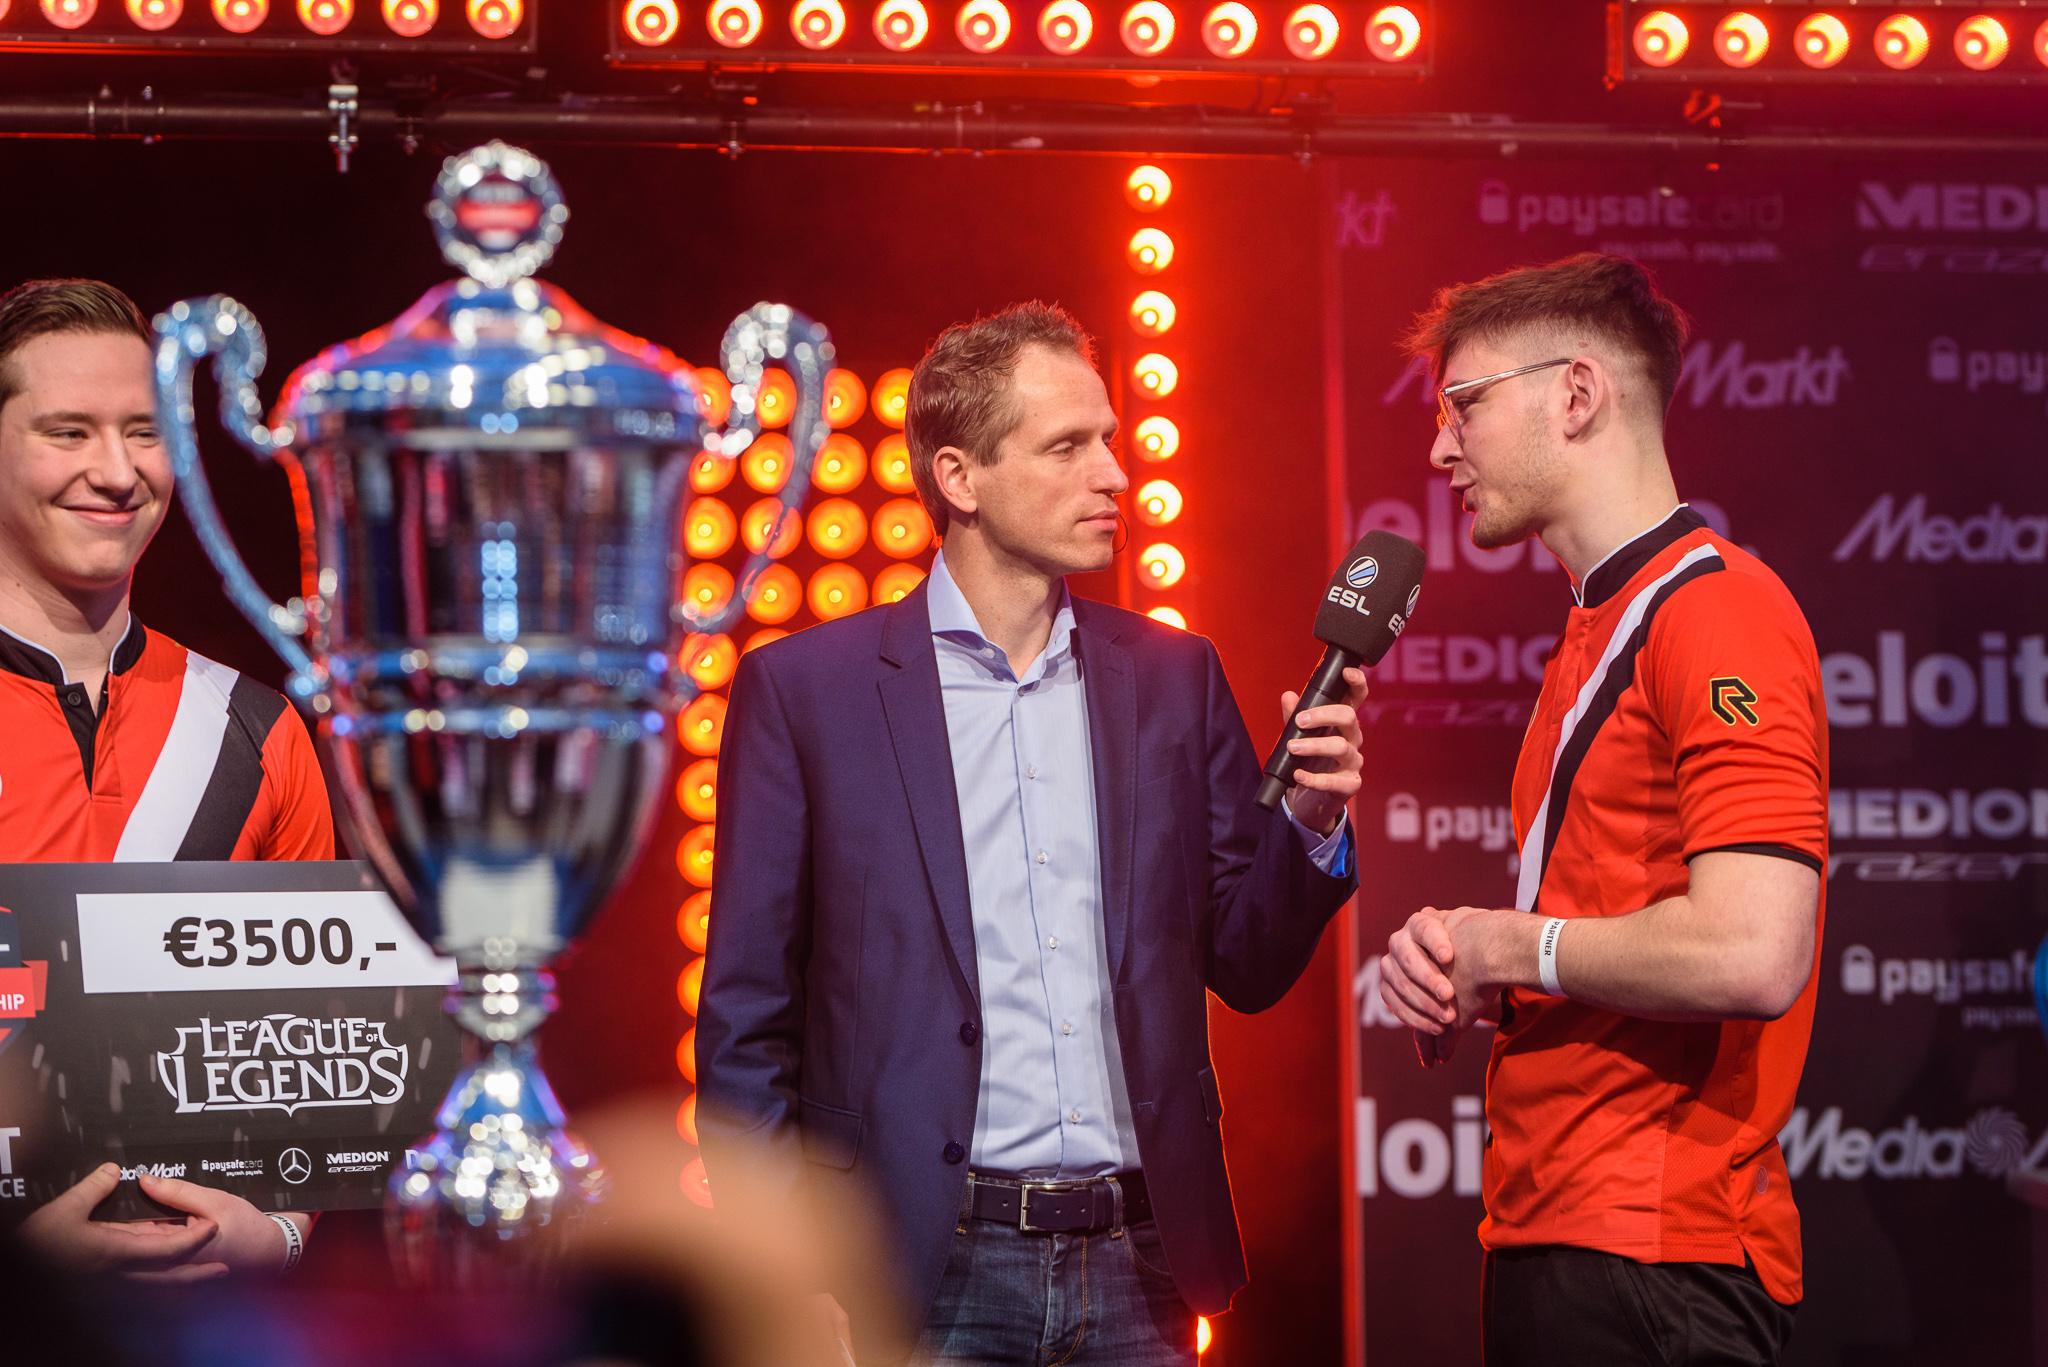 ESL Dutch Championship League of Legends volgende week van start!